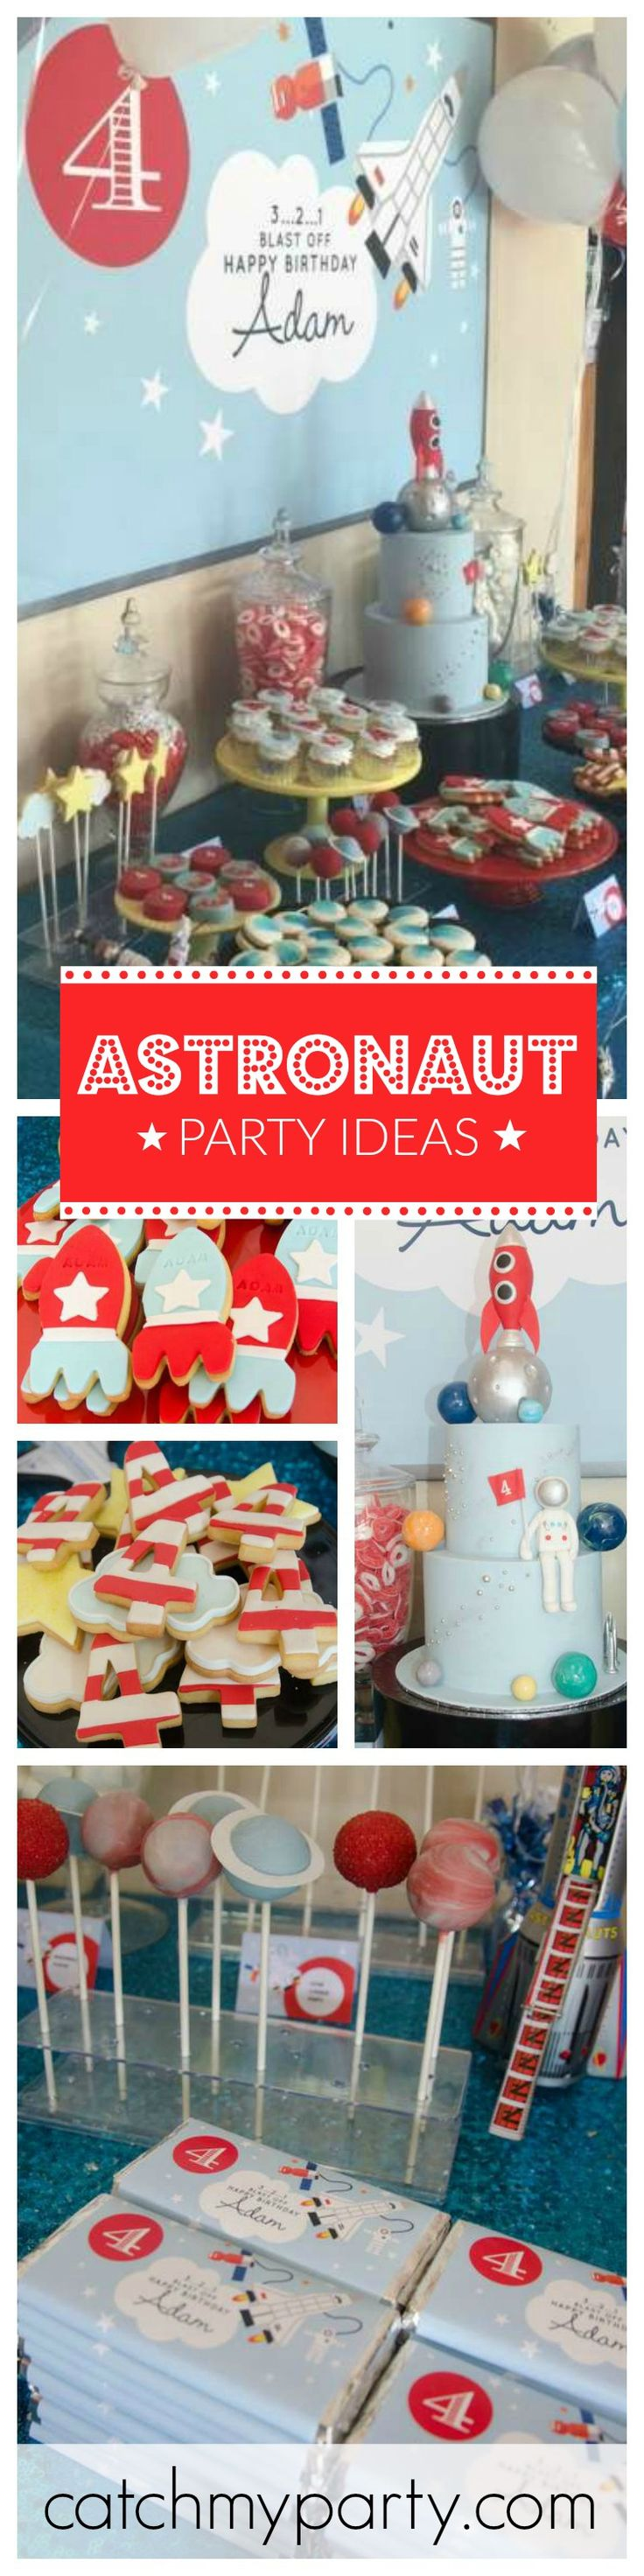 Best  Astronaut Party Ideas On Pinterest - Astronaut decorations